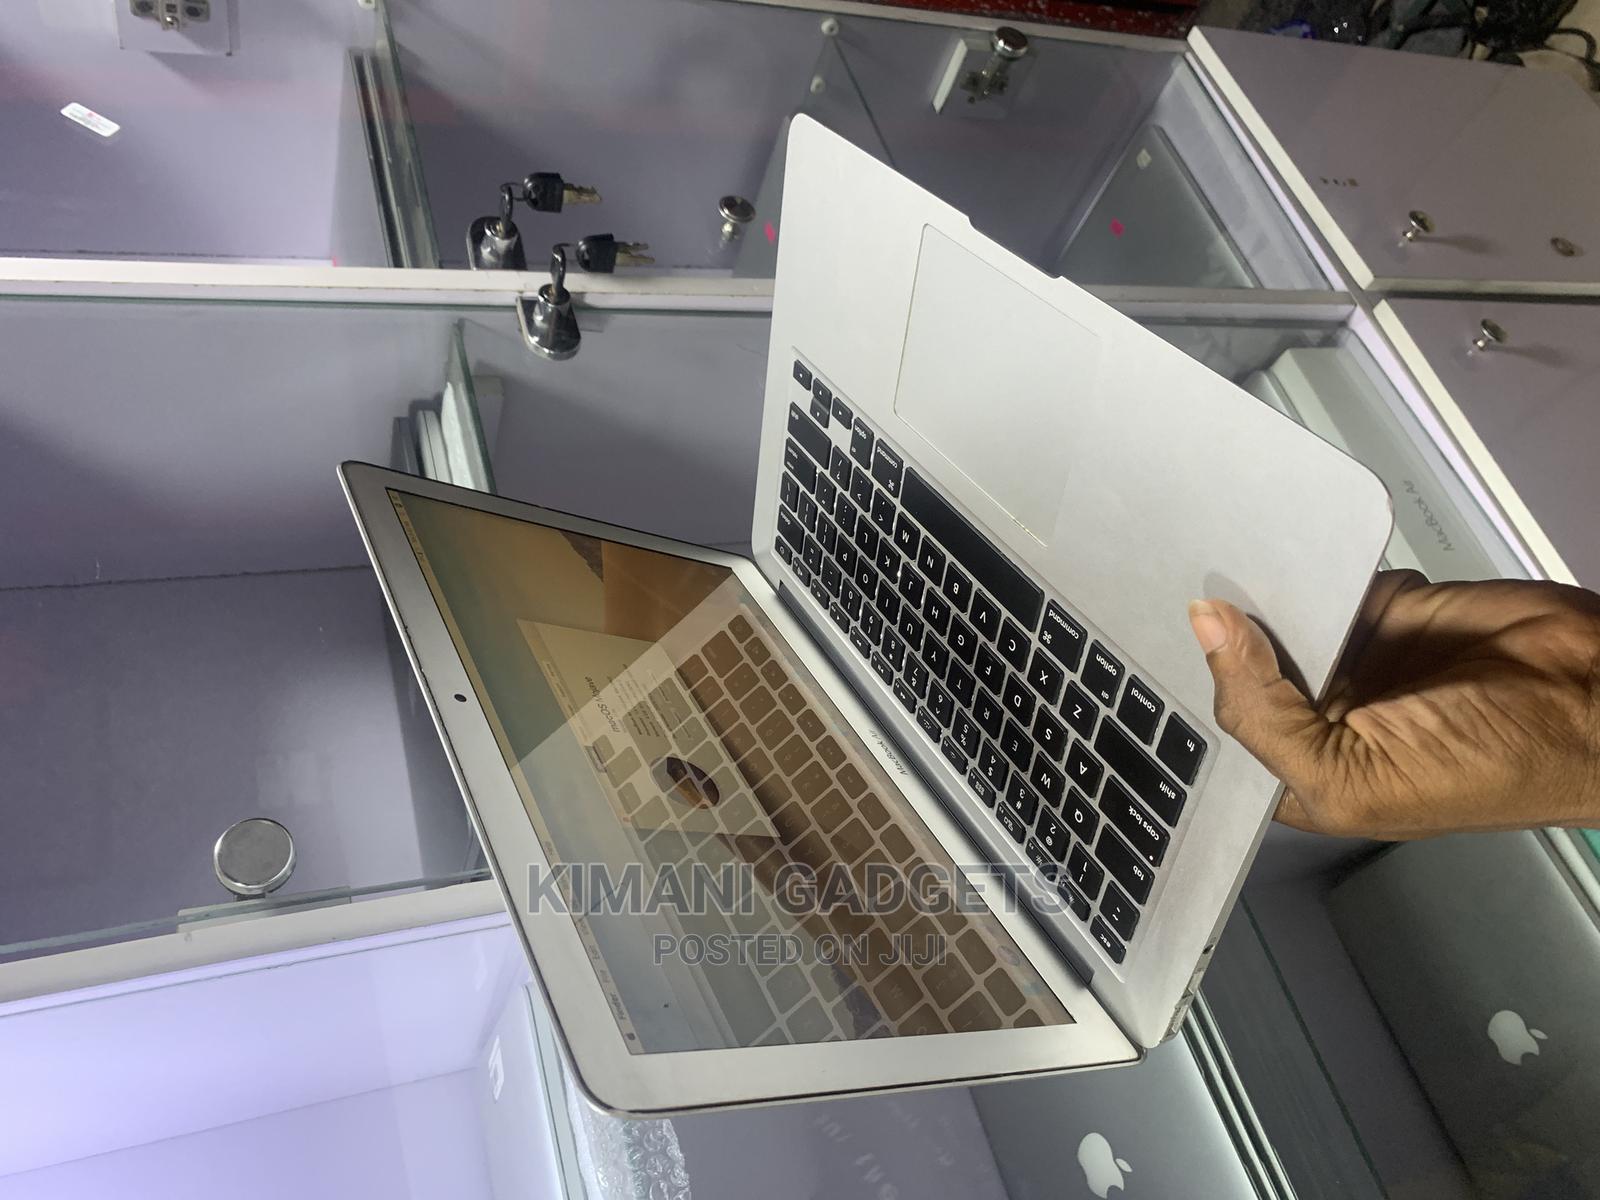 Laptop Apple MacBook Air 2012 4GB Intel Core I5 SSD 128GB | Laptops & Computers for sale in Ikeja, Lagos State, Nigeria